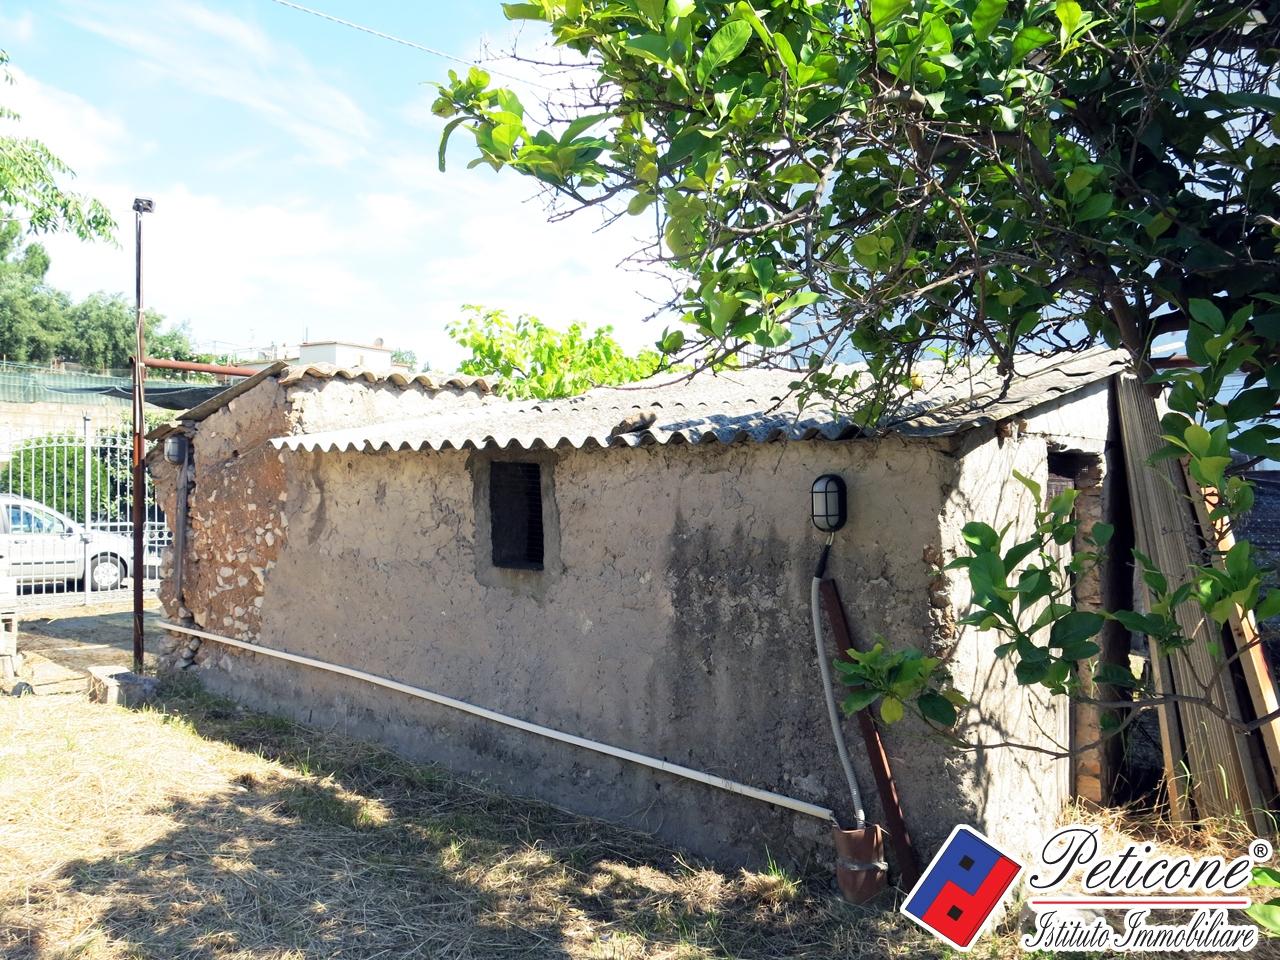 Villa in Vendita a Gaeta: 5 locali, 250 mq - Foto 30